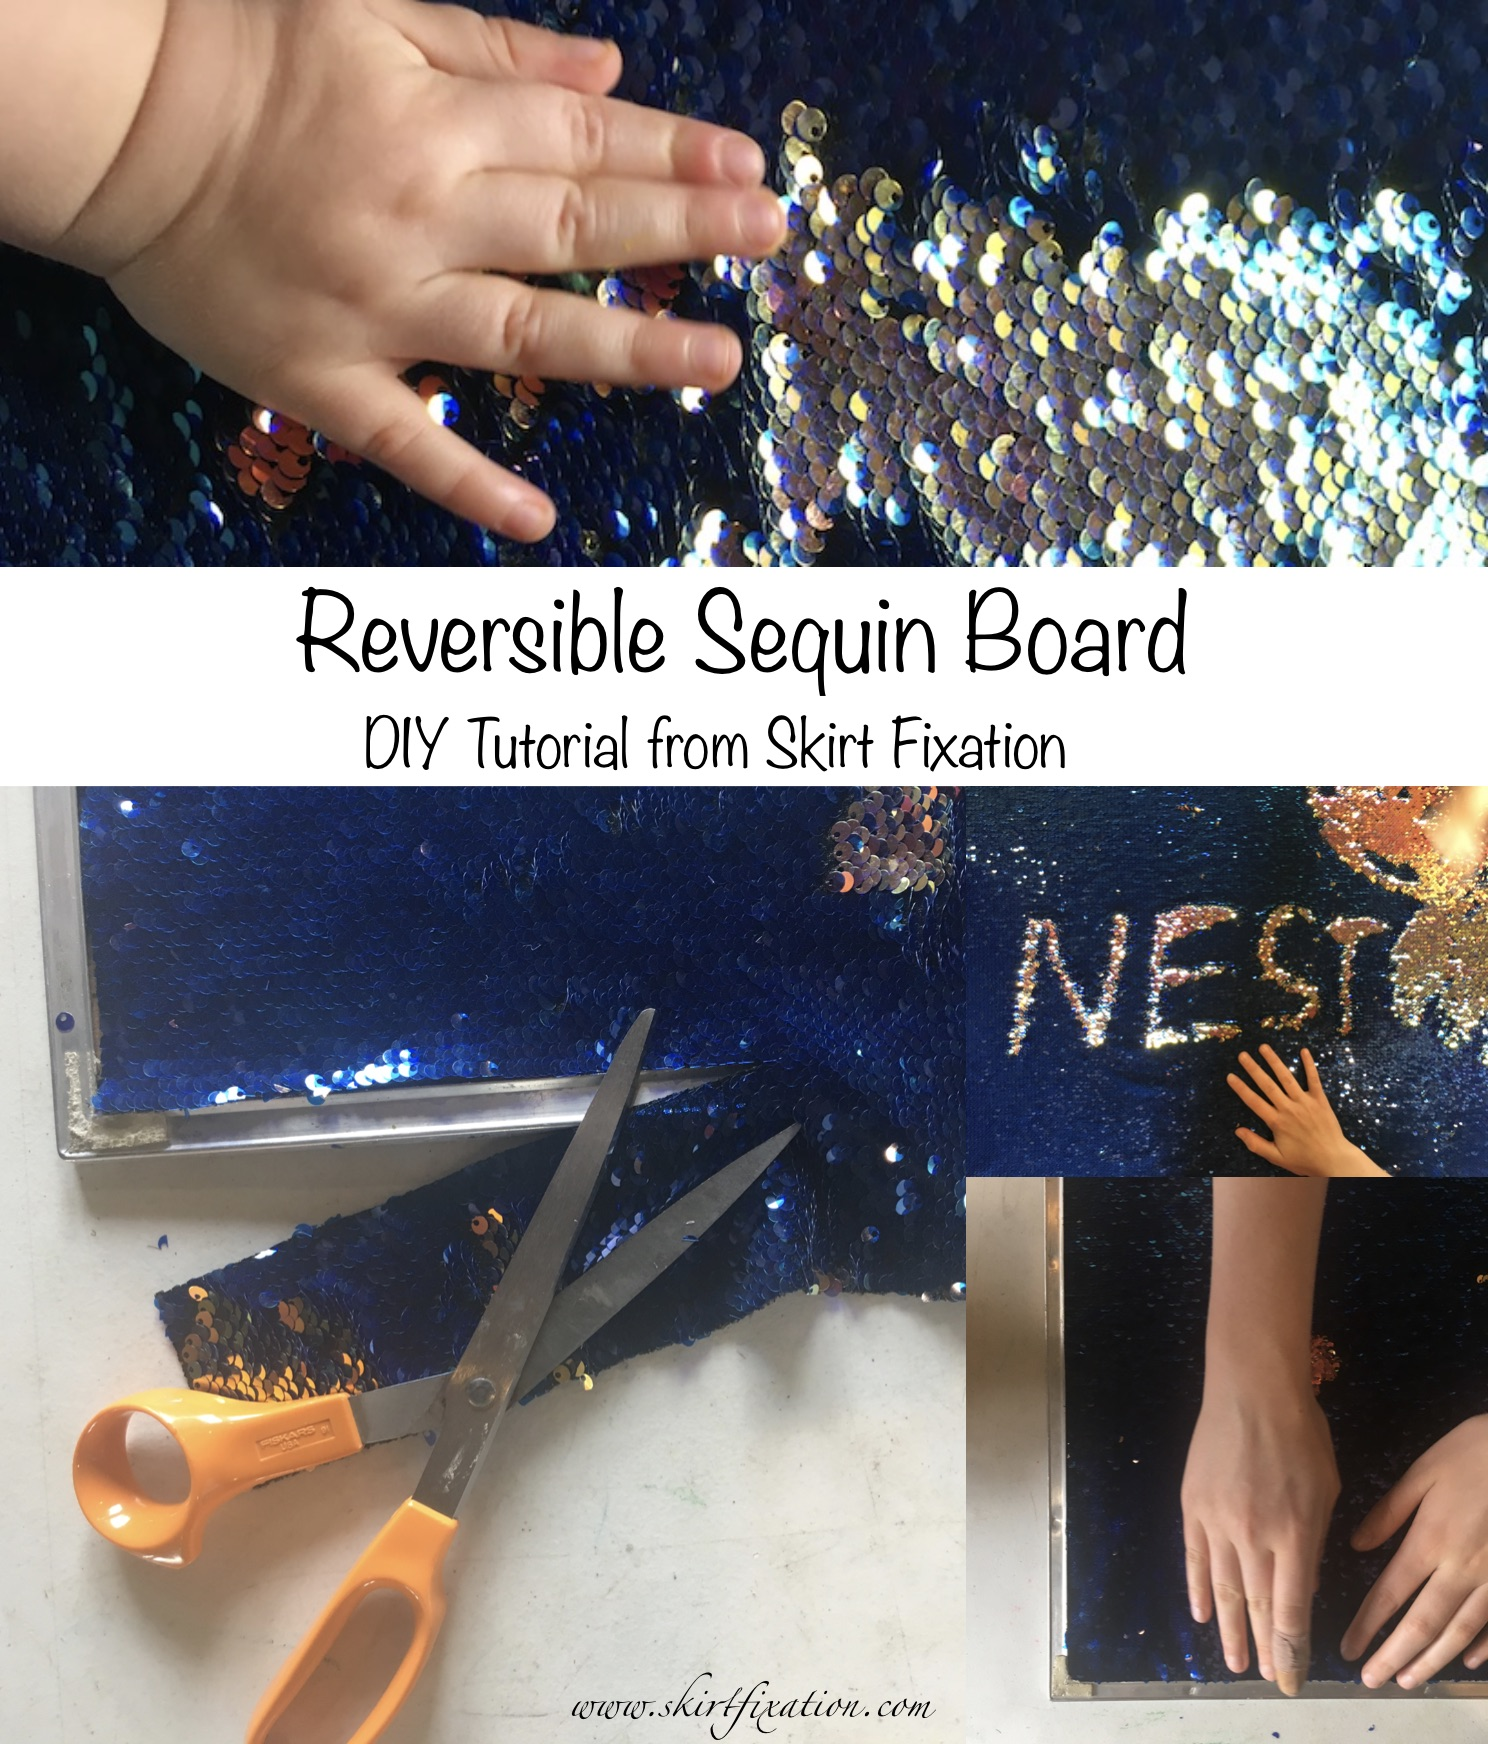 DIY reversible sequin board tutorial from Skirt Fixation blog.